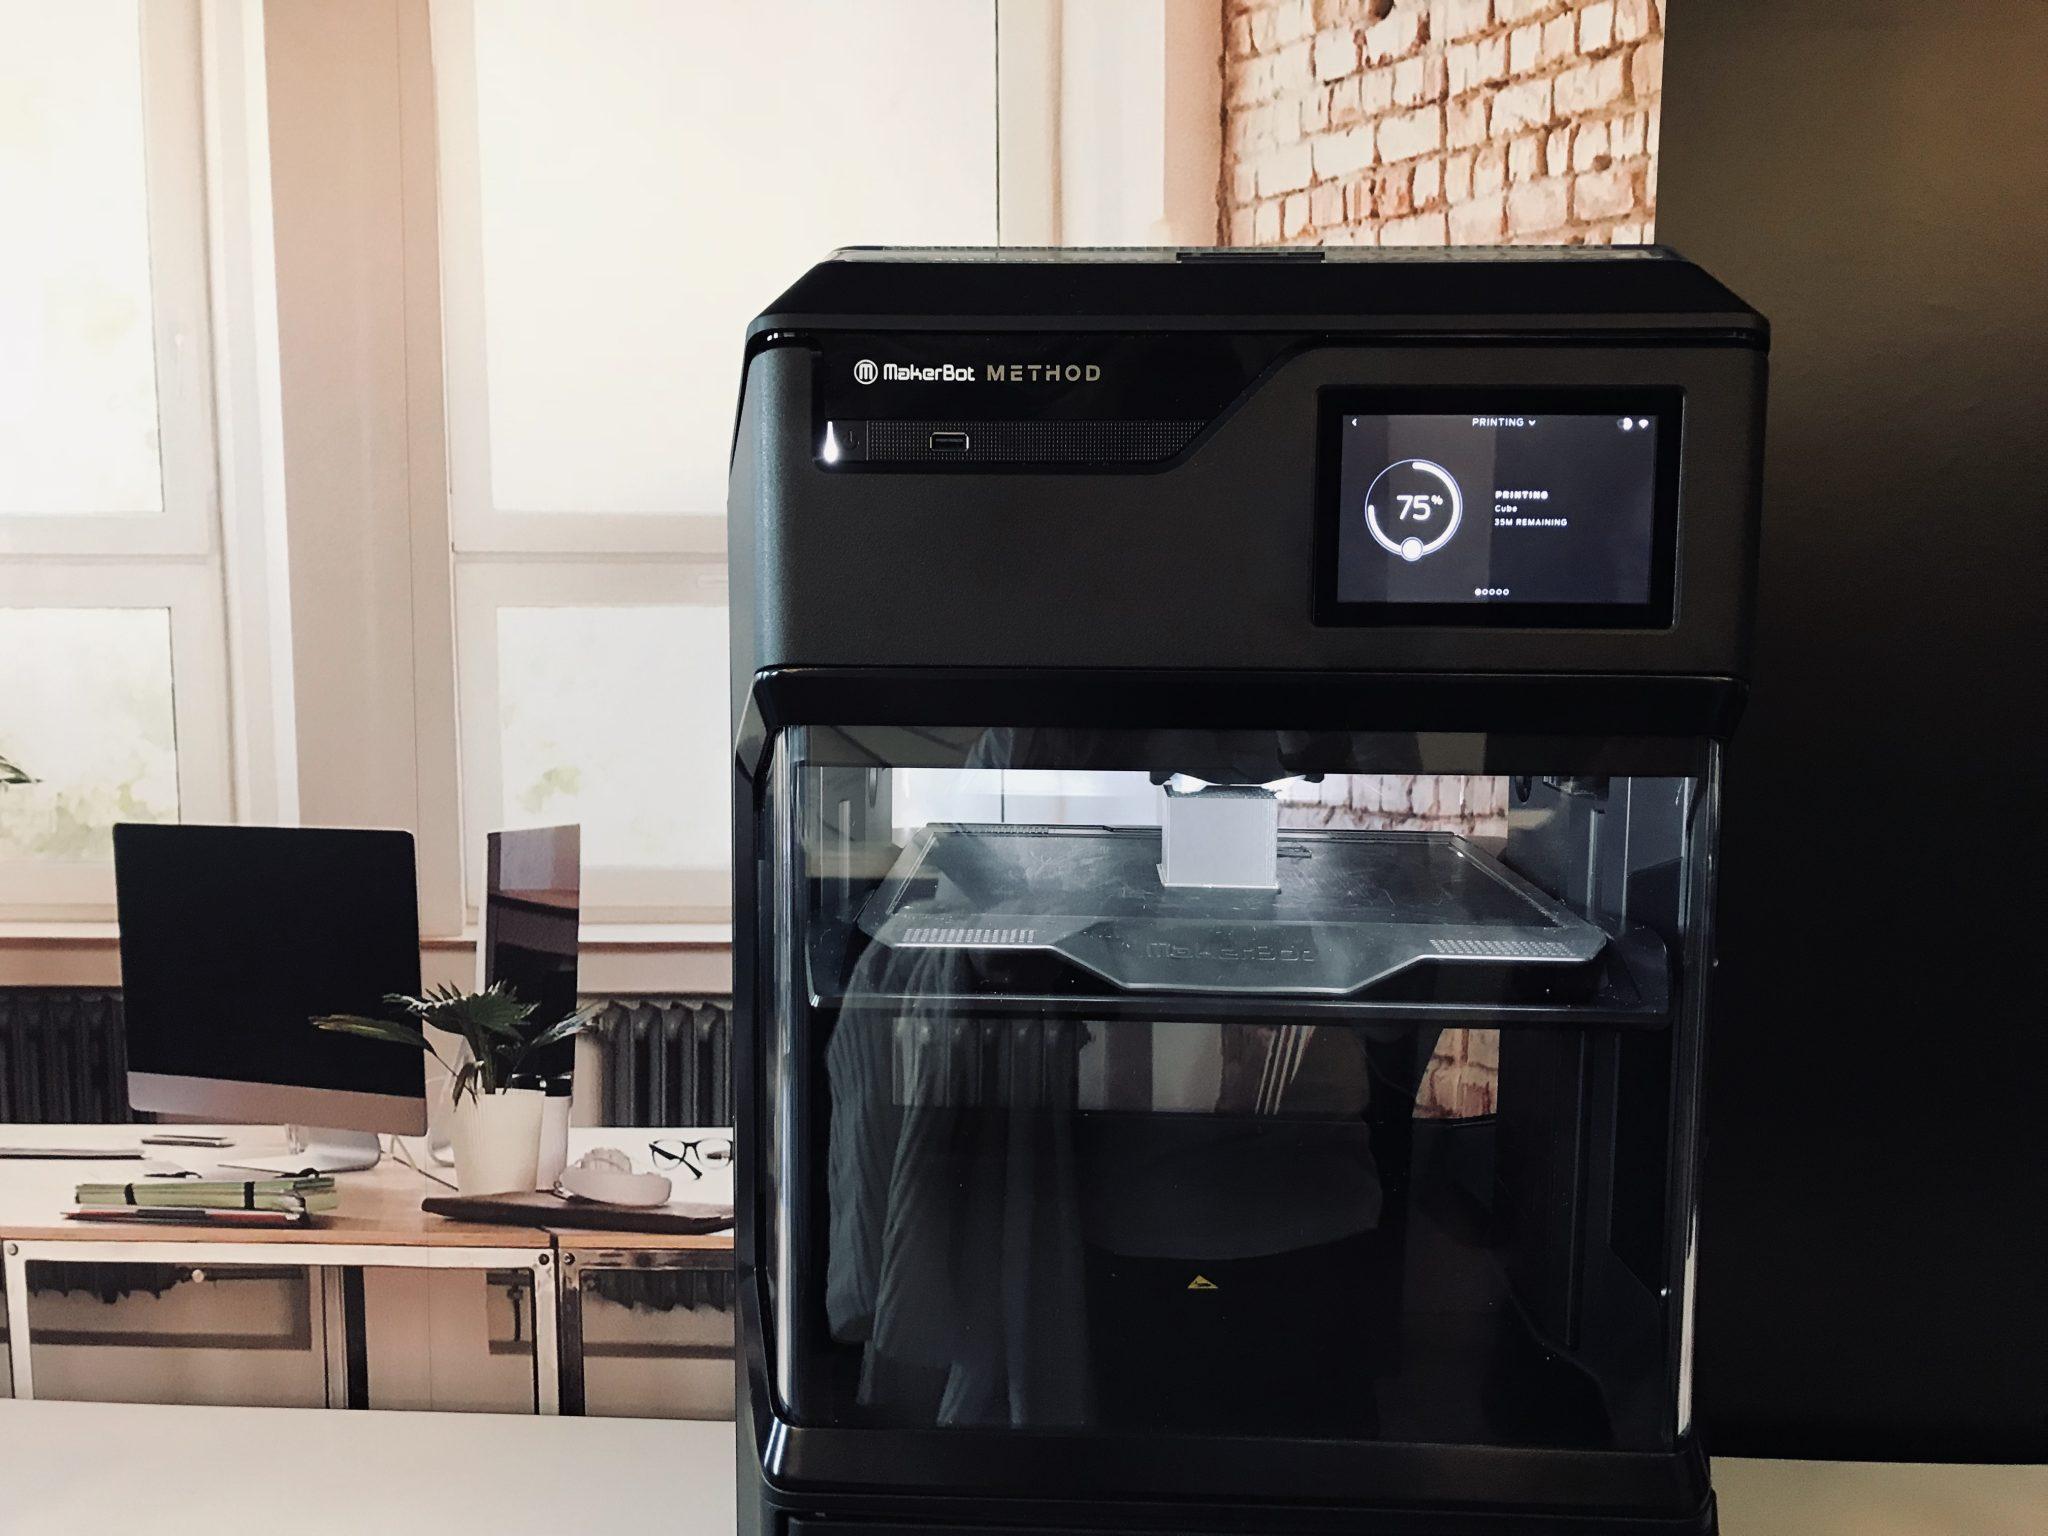 The MakerBot Method 3D printer. Photo via Beau Jackson